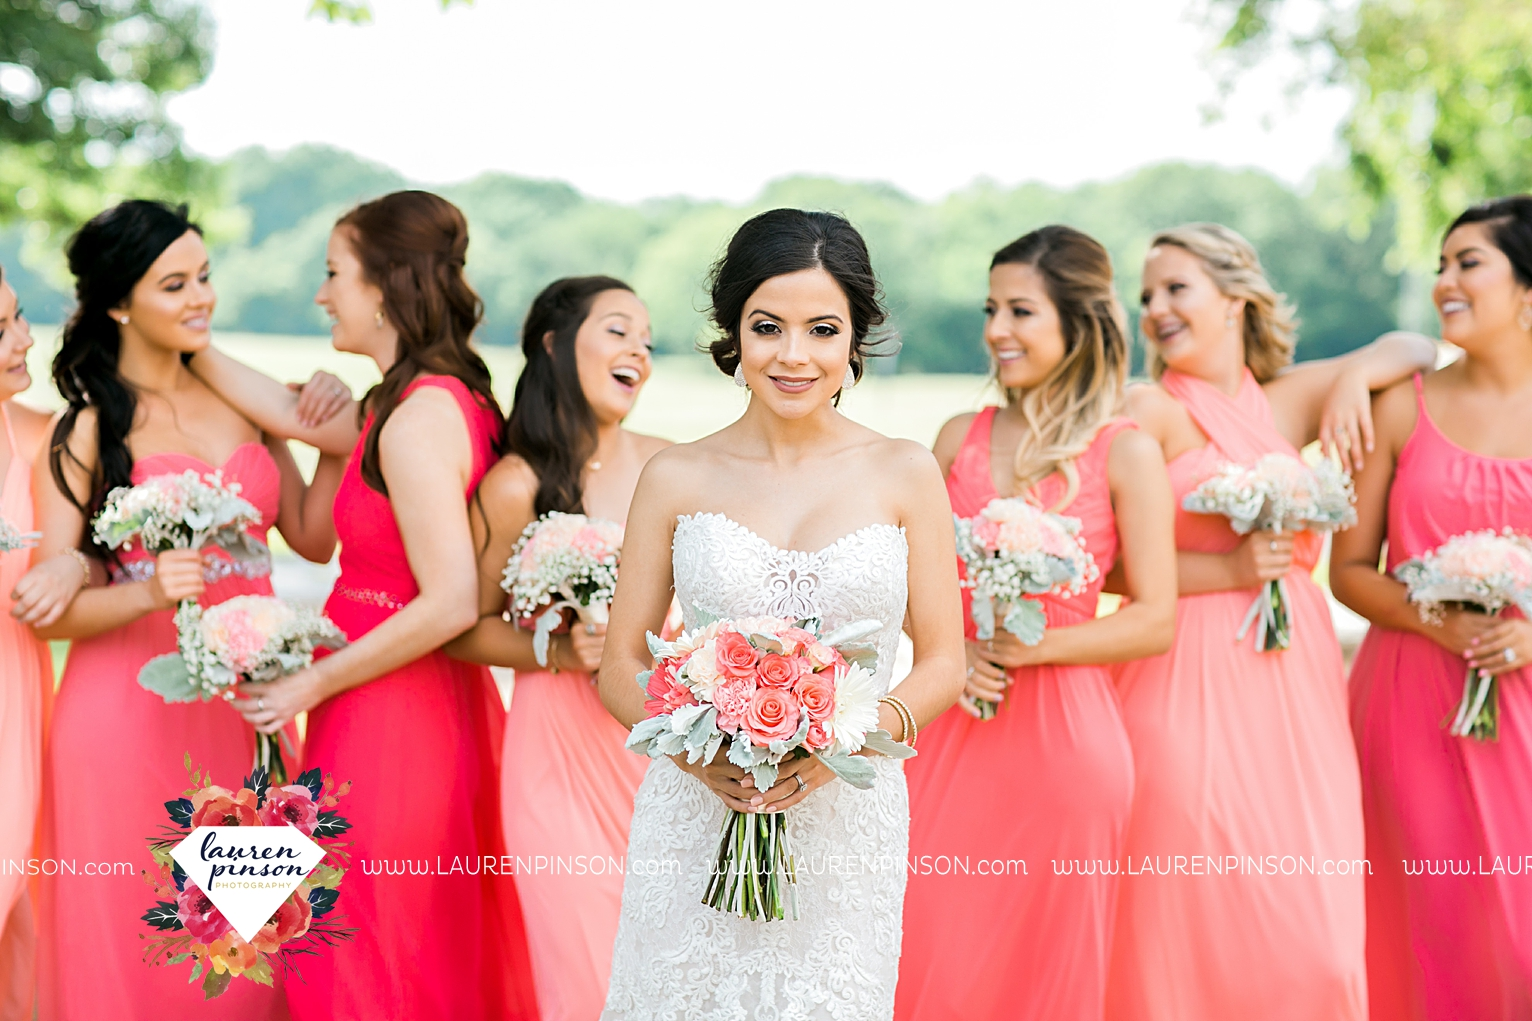 wichita-falls-wedding-nocona-comanche-rose-ranch-rustic-pink-gray-photography-00123.jpg